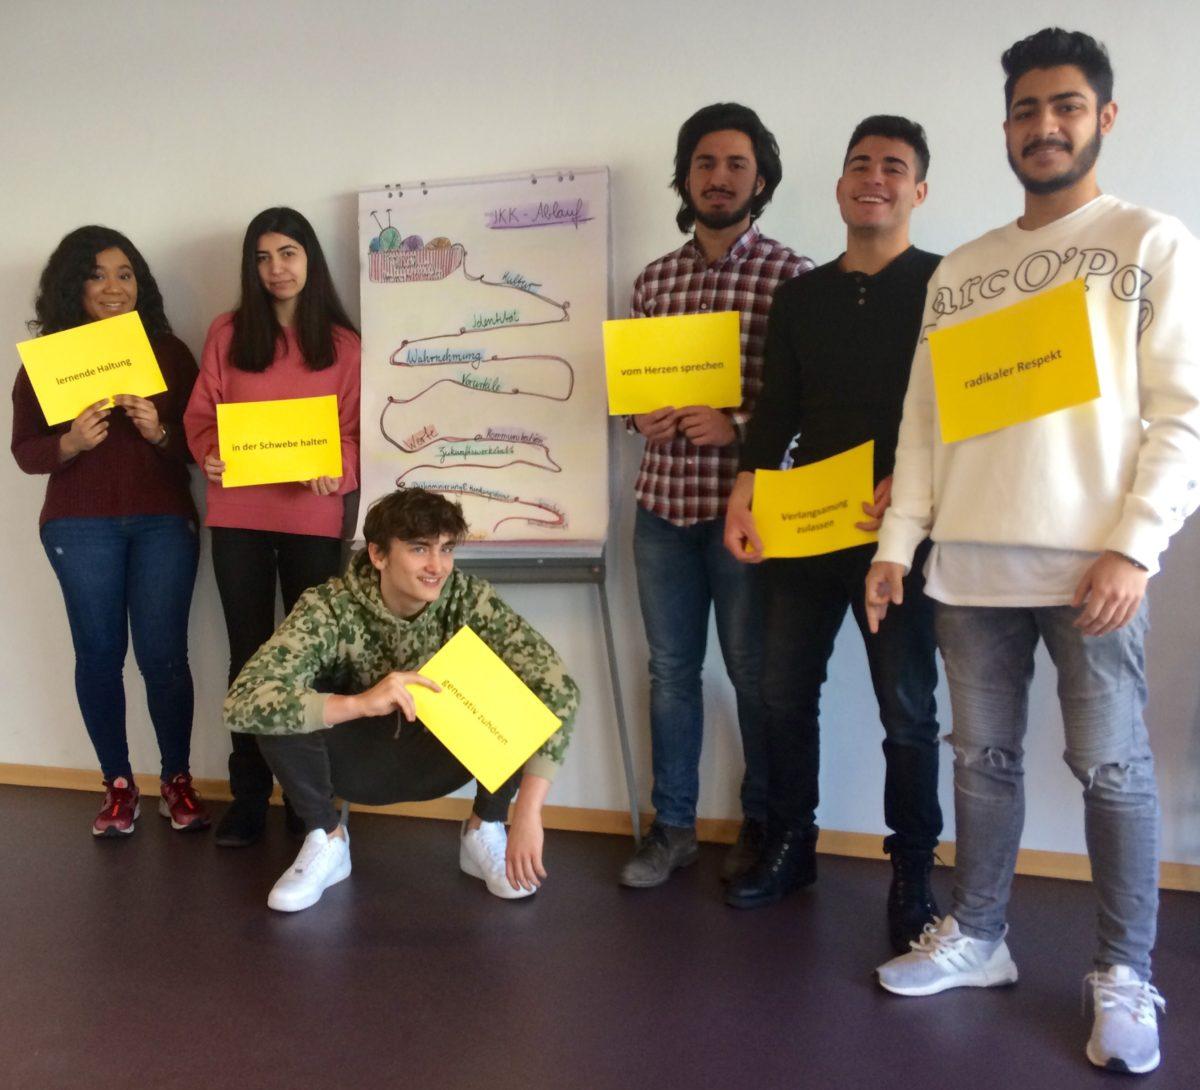 Interkulturelles Kompetenztraining in Jahrgang 12